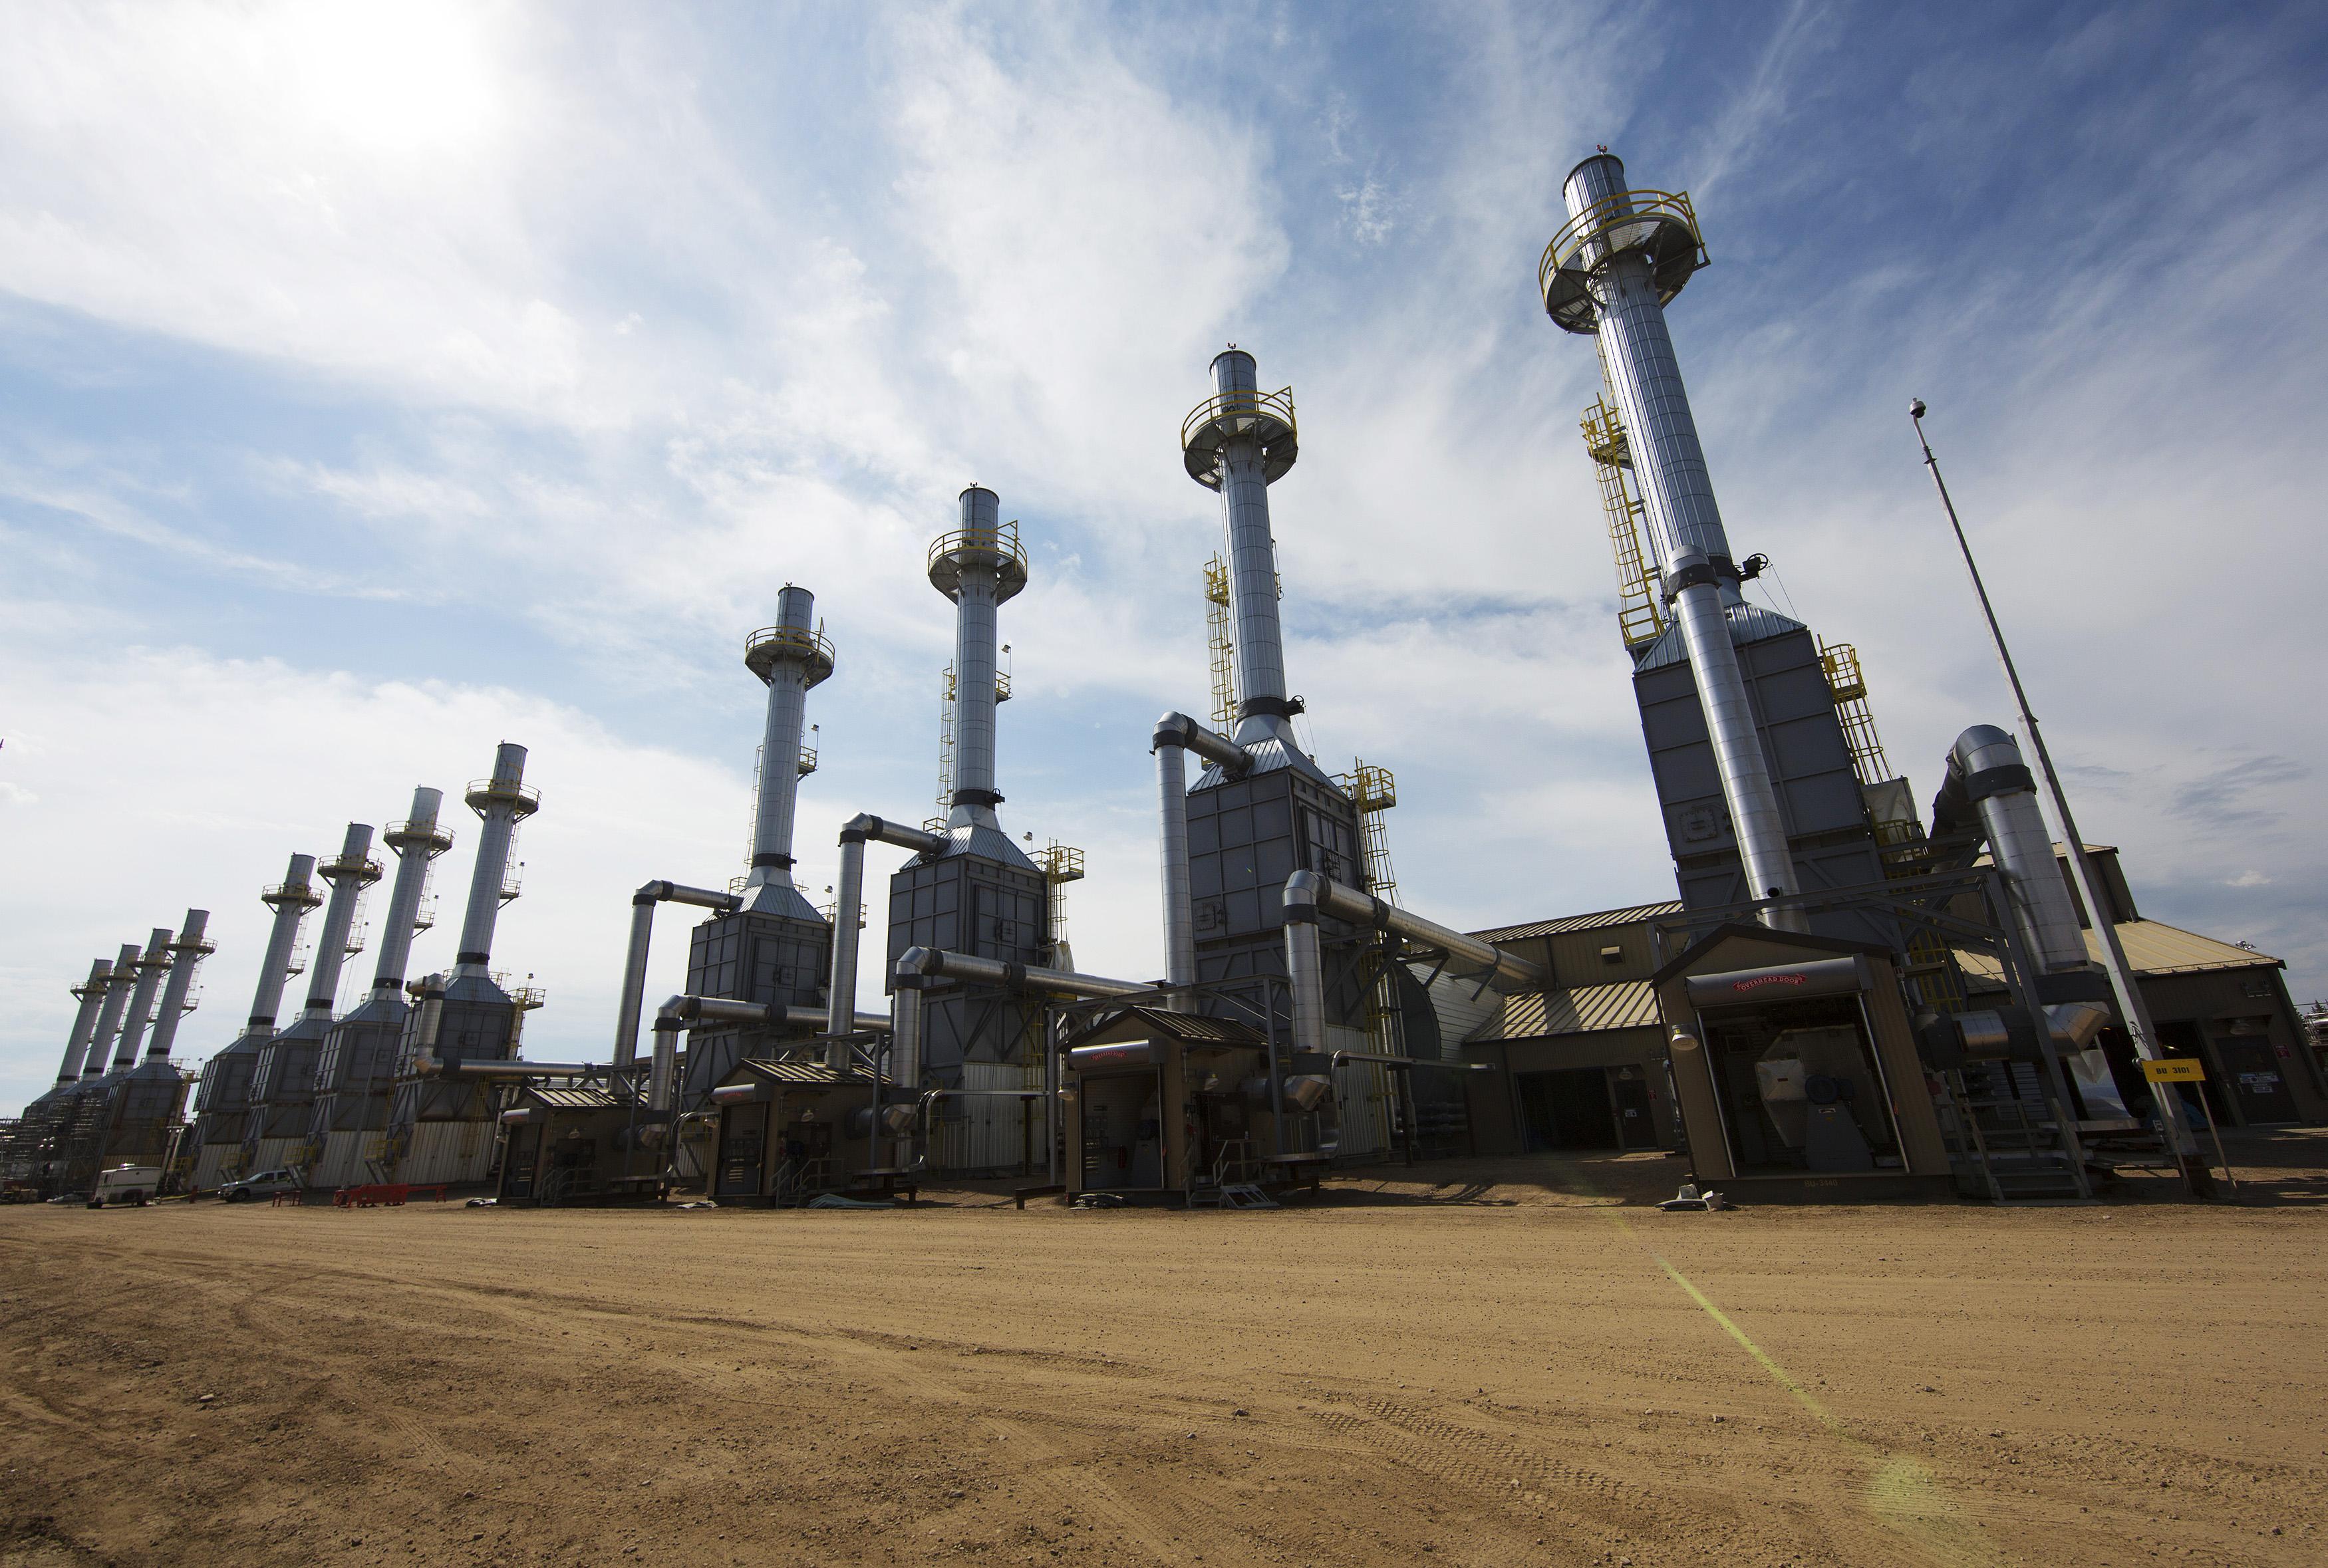 Cenovus Energy (CVE.TO) Stock Confidently Gains Momentum: Worth Exploring It?